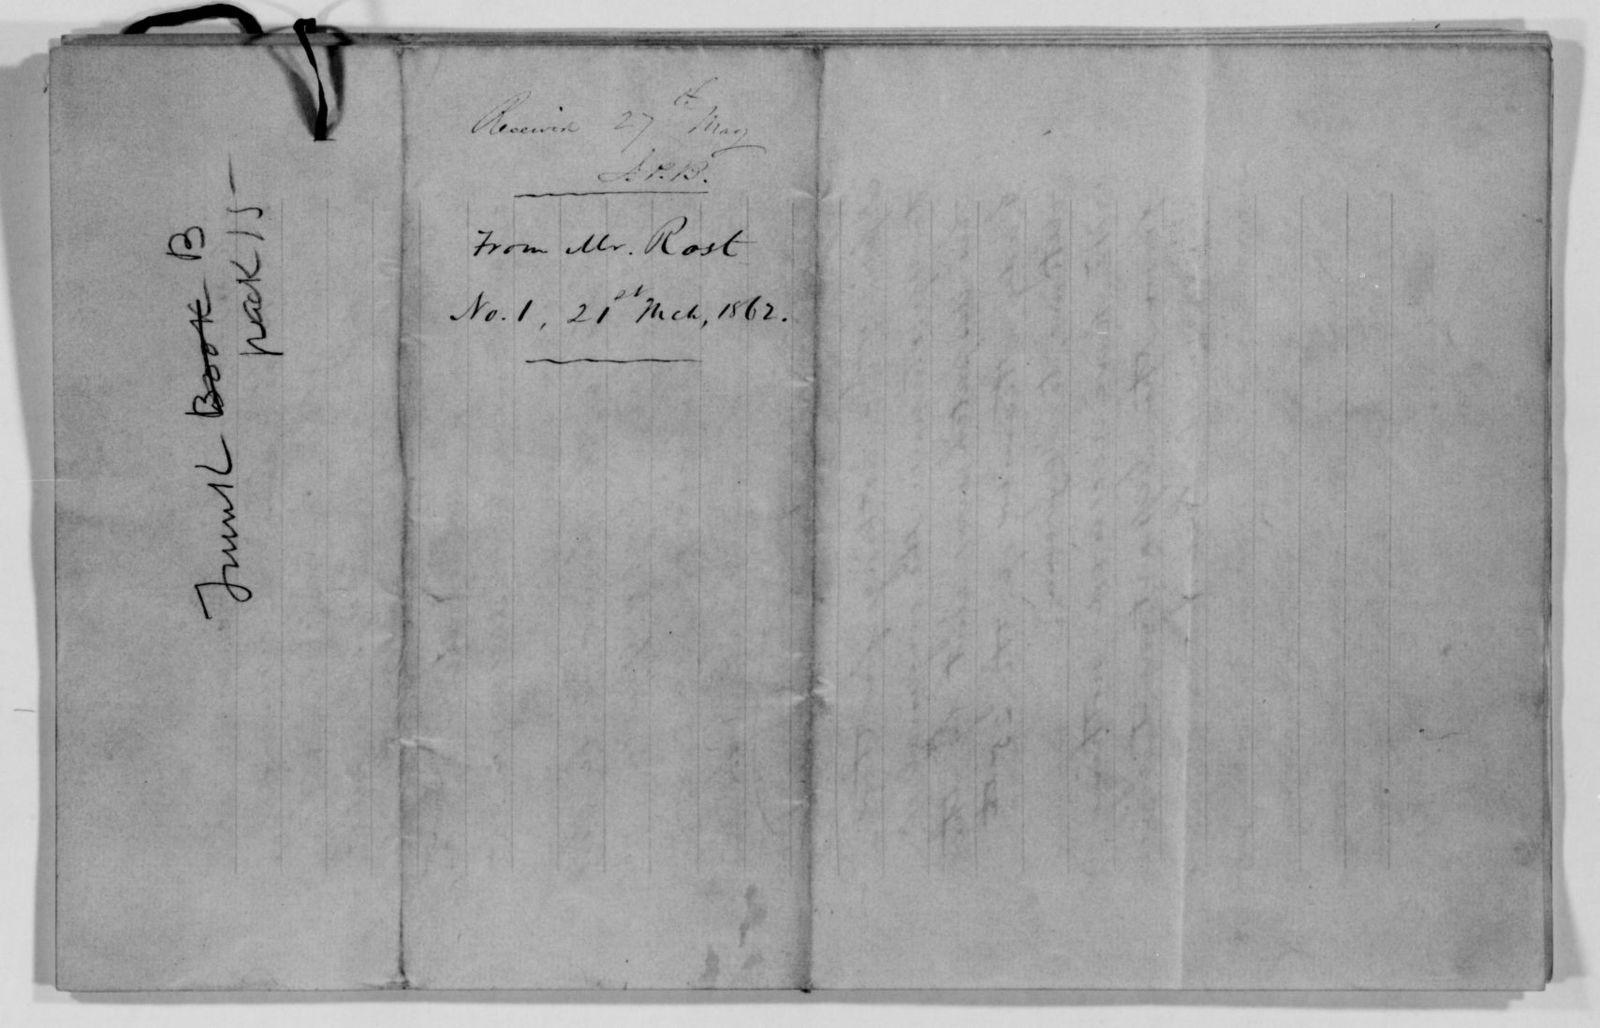 Confederate States of America records: Microfilm Reel 4